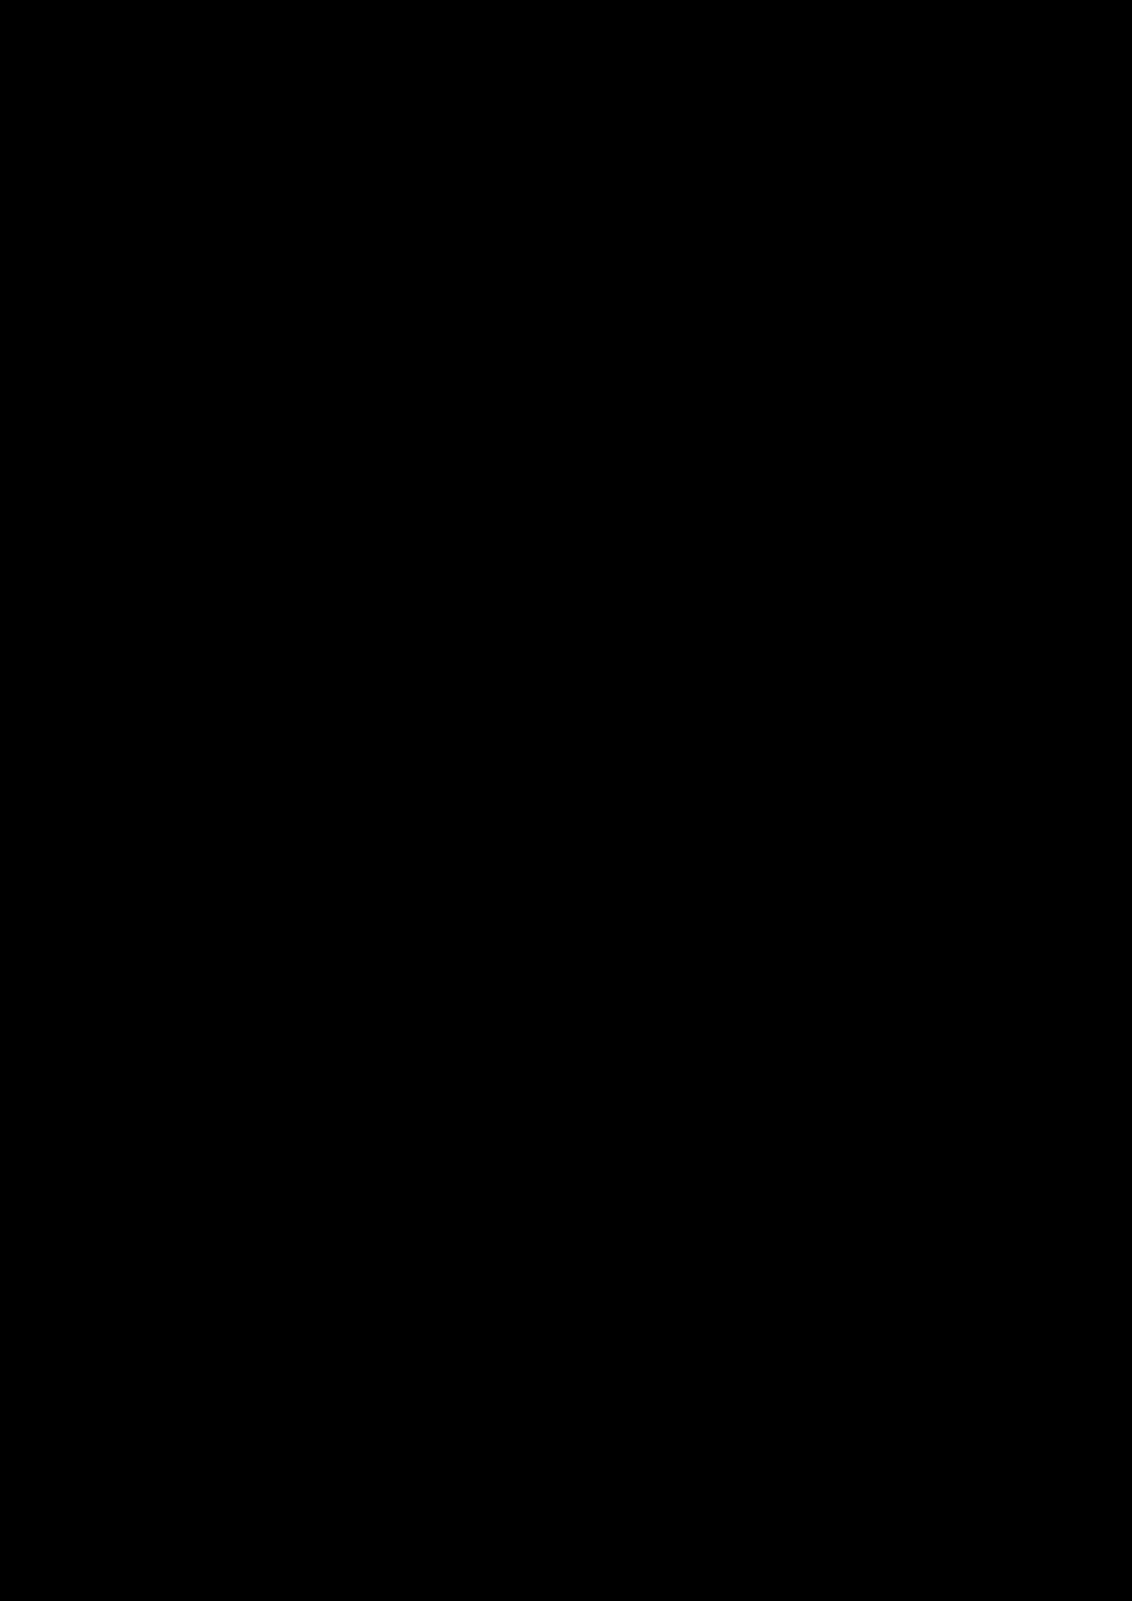 Belyiy sokol slide, Image 153